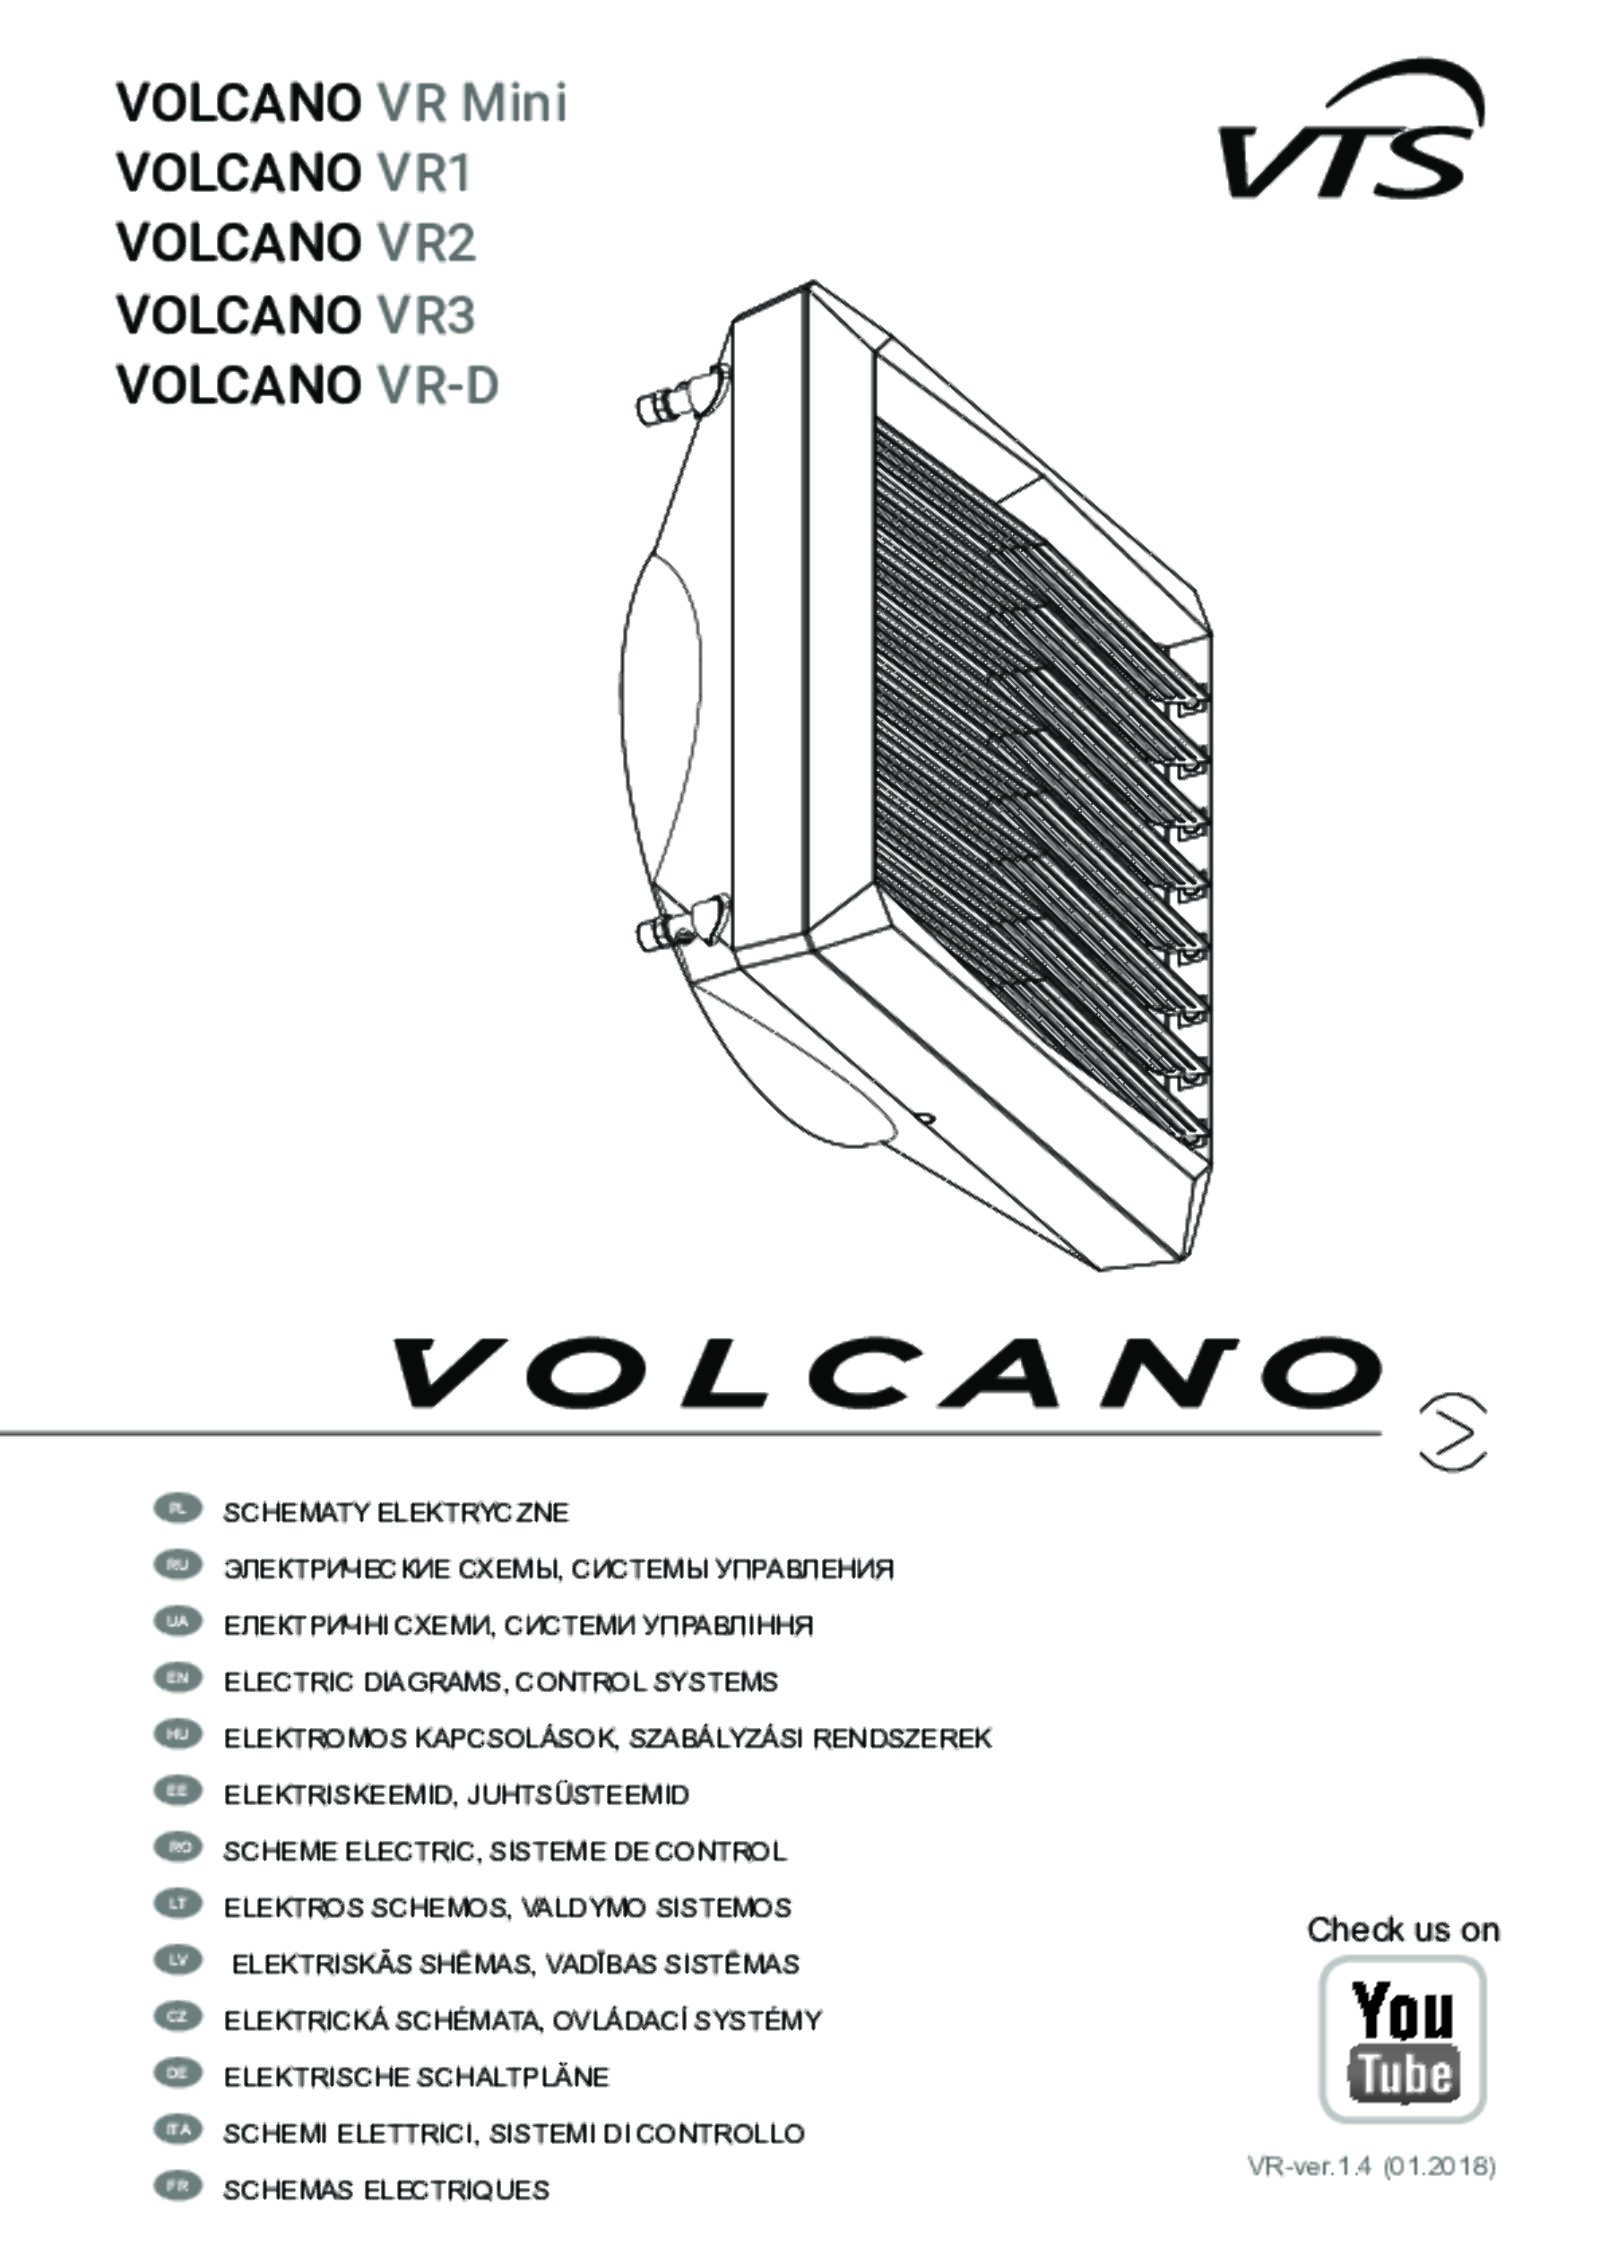 Volcano 3 ec - 1-4-0101-0444 - vts group